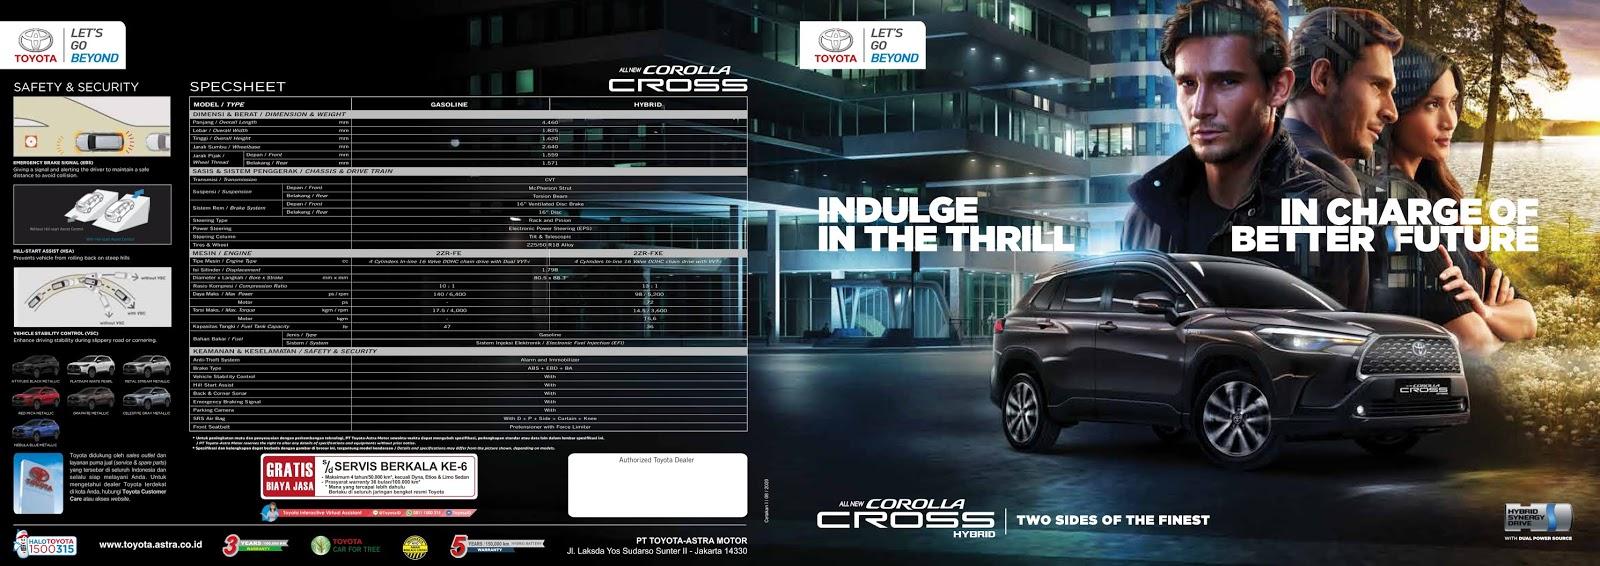 Harga Promo Toyota Cross Medan